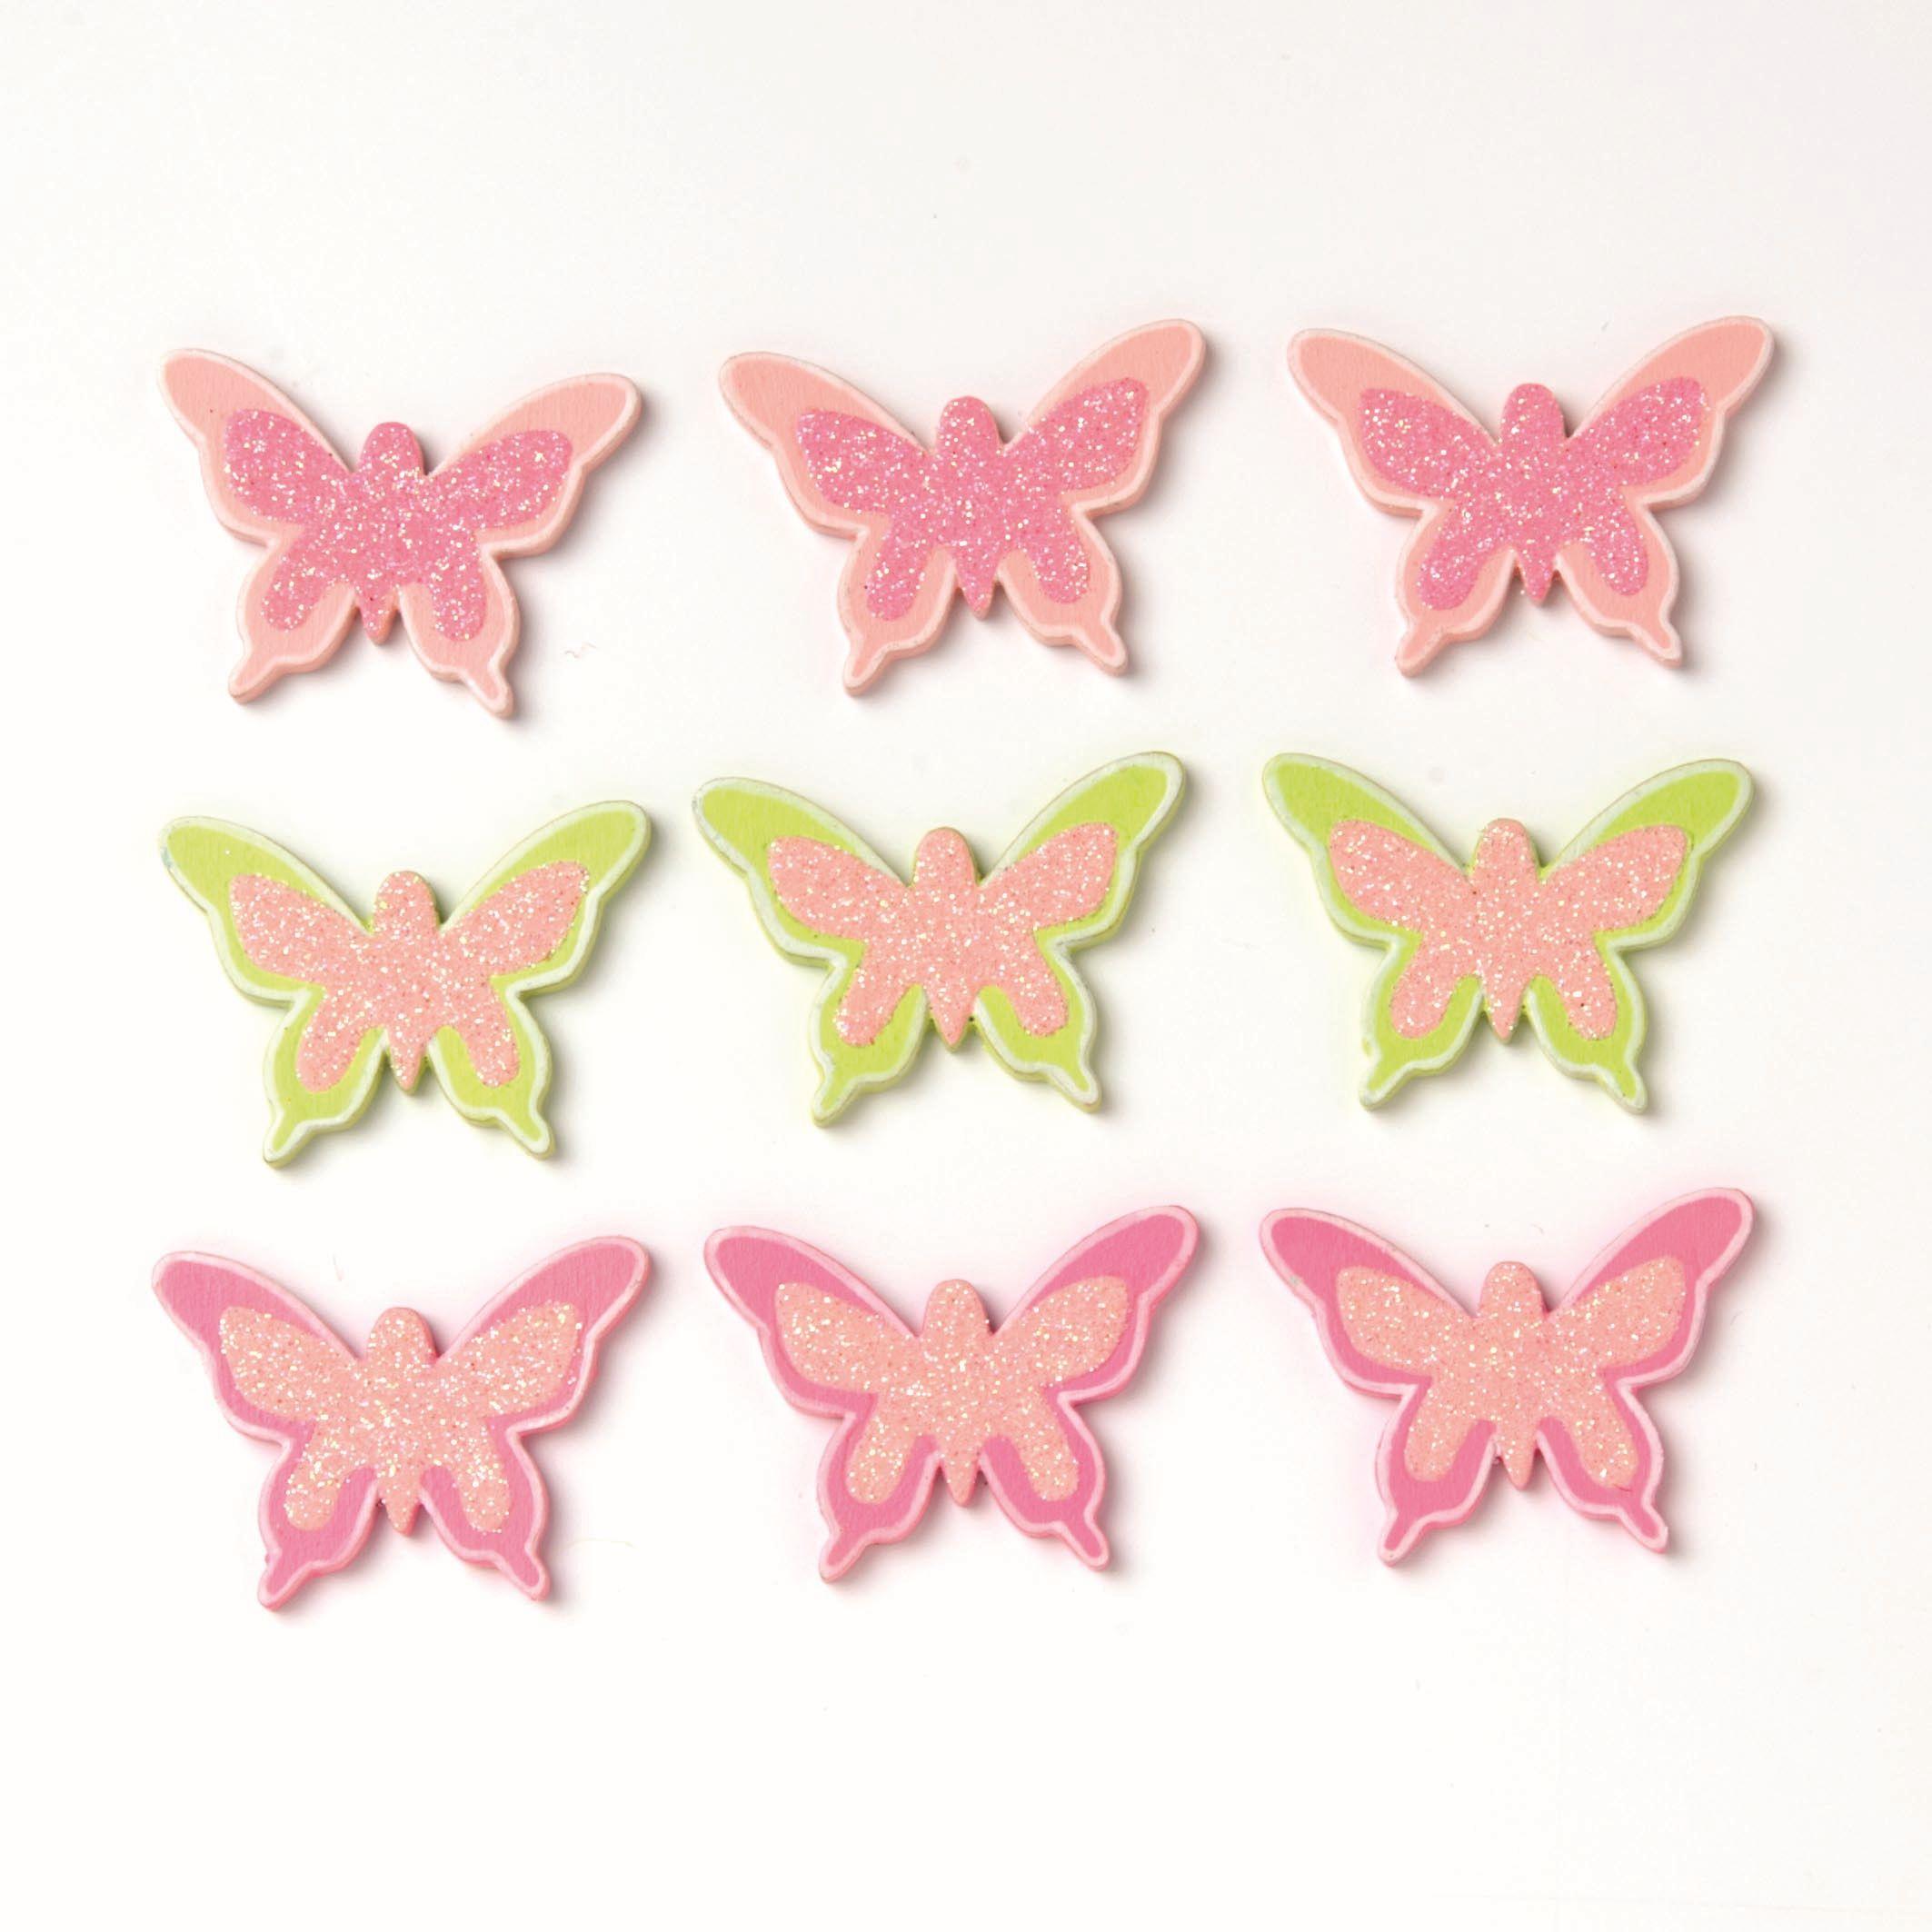 61710019 Фигурки из дерева 'Бабочка', 35 мм, упак./9 шт., Glorex